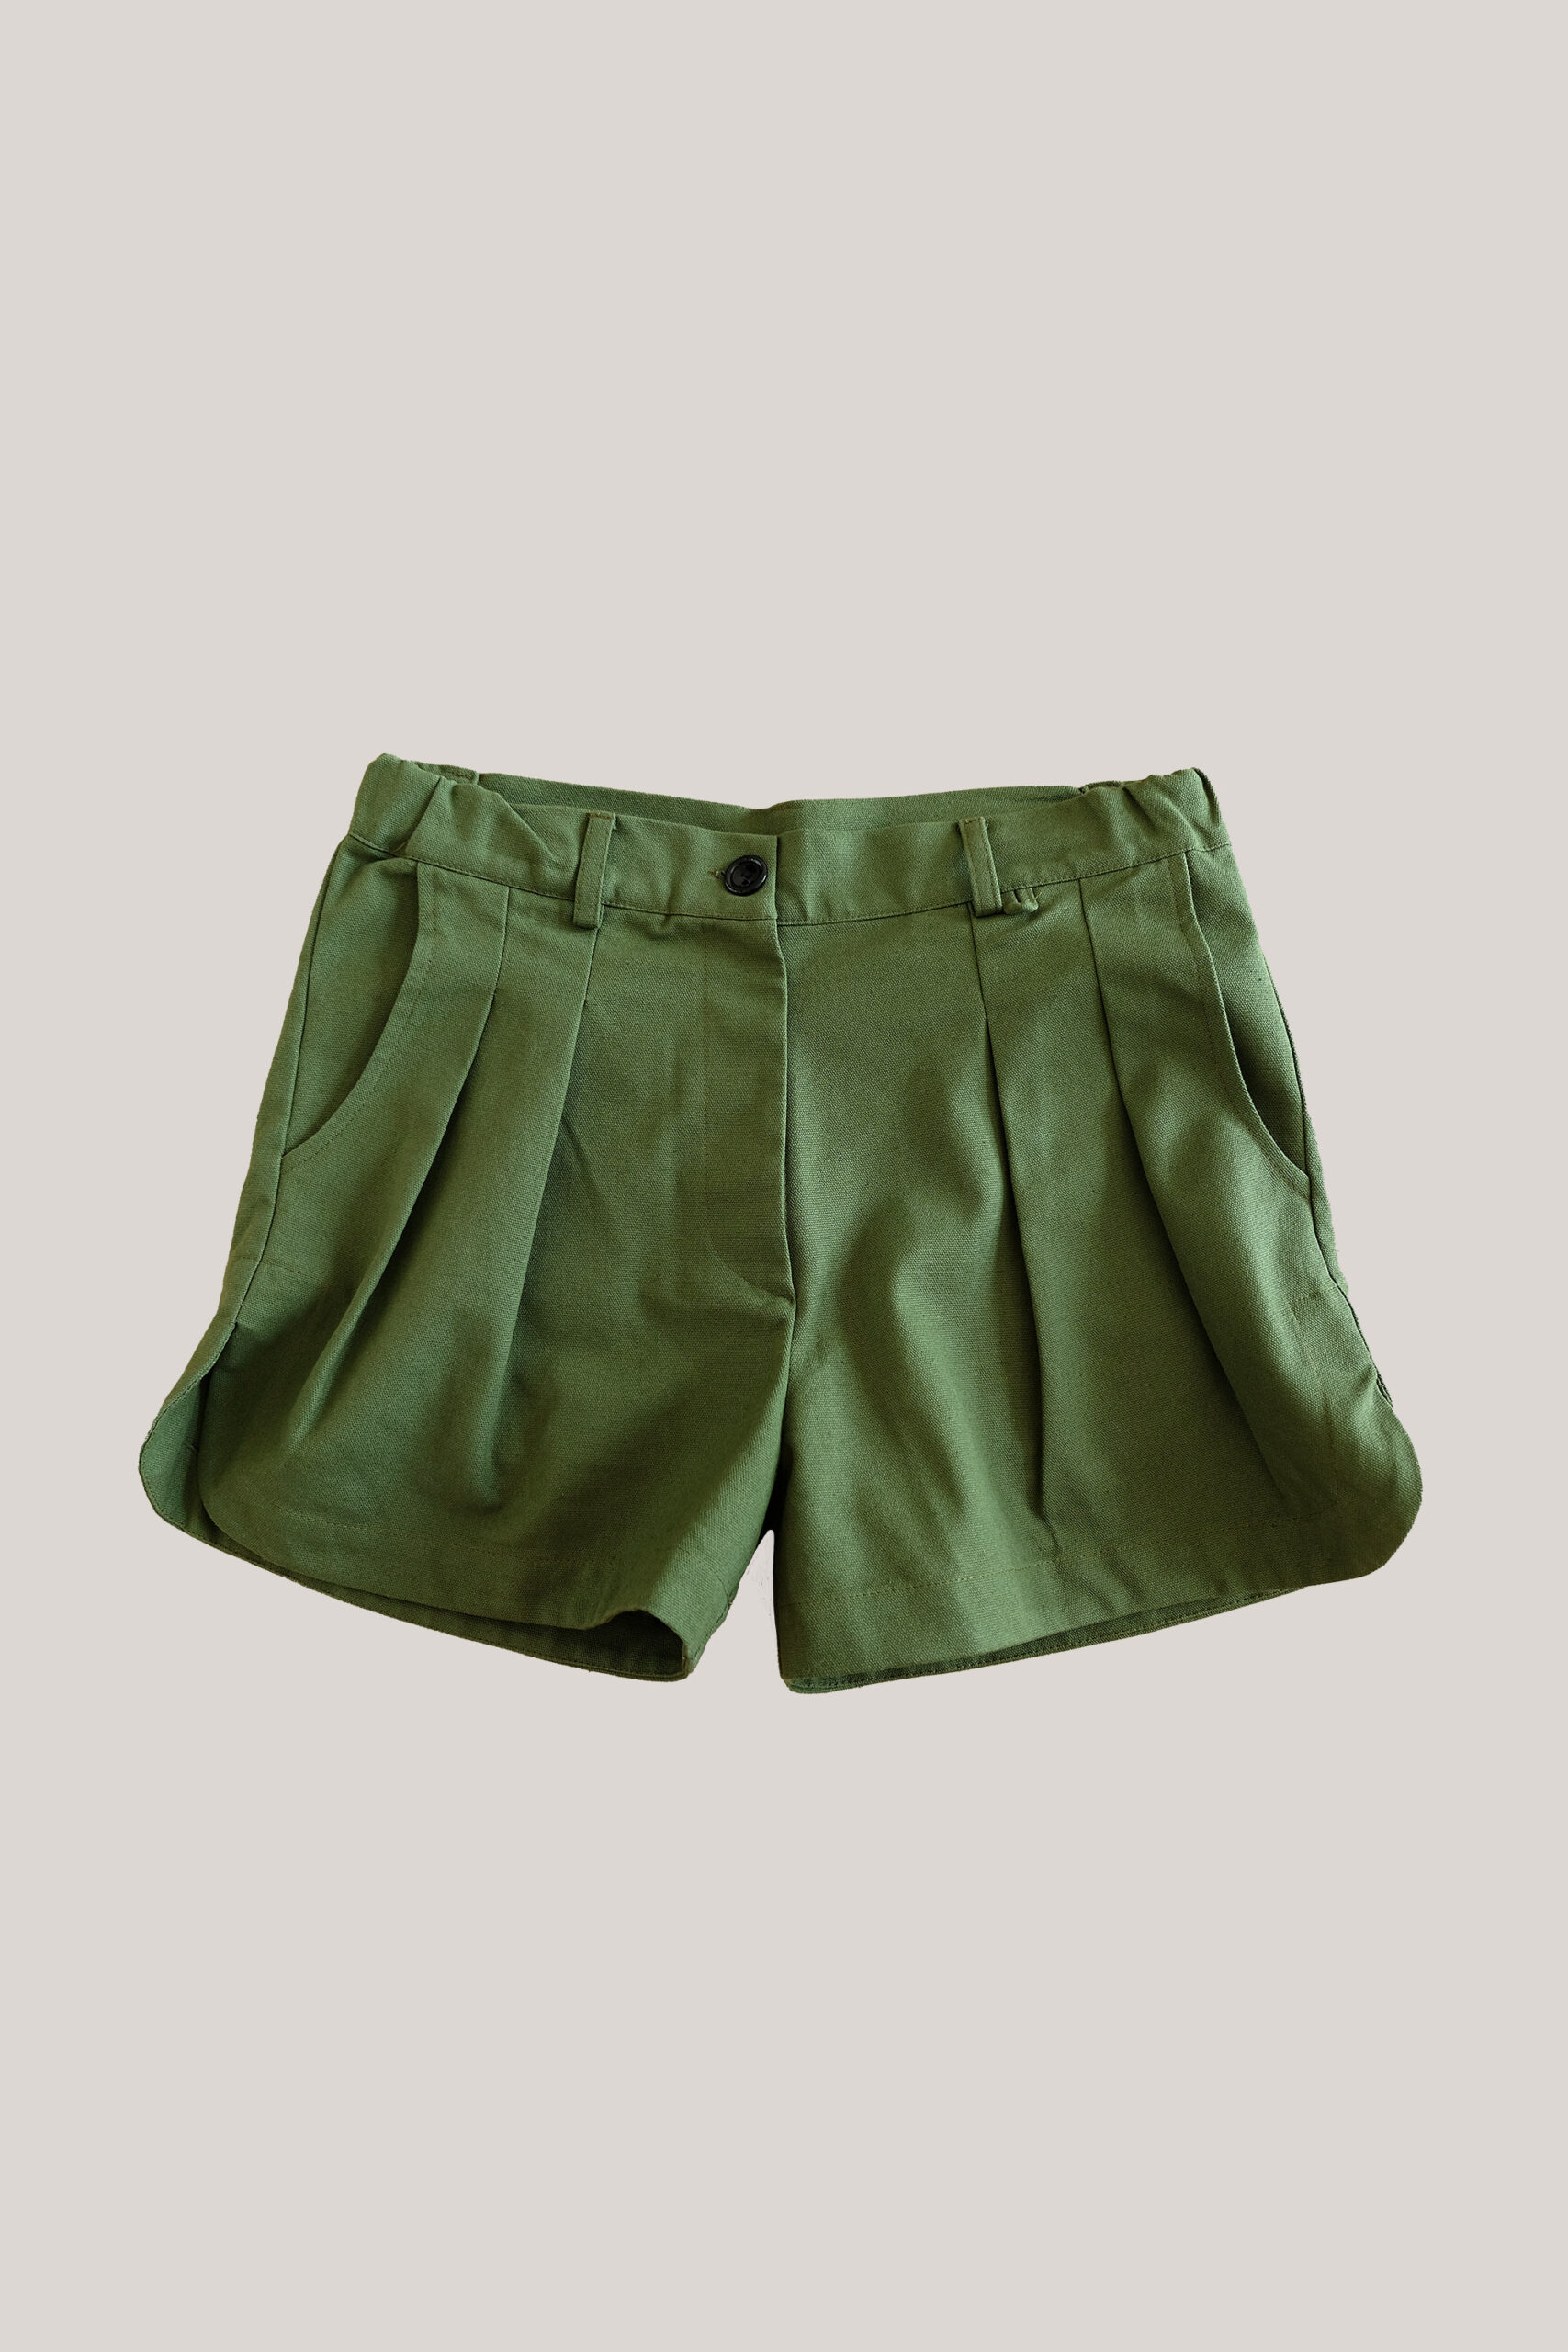 Canvas-Shorts-1